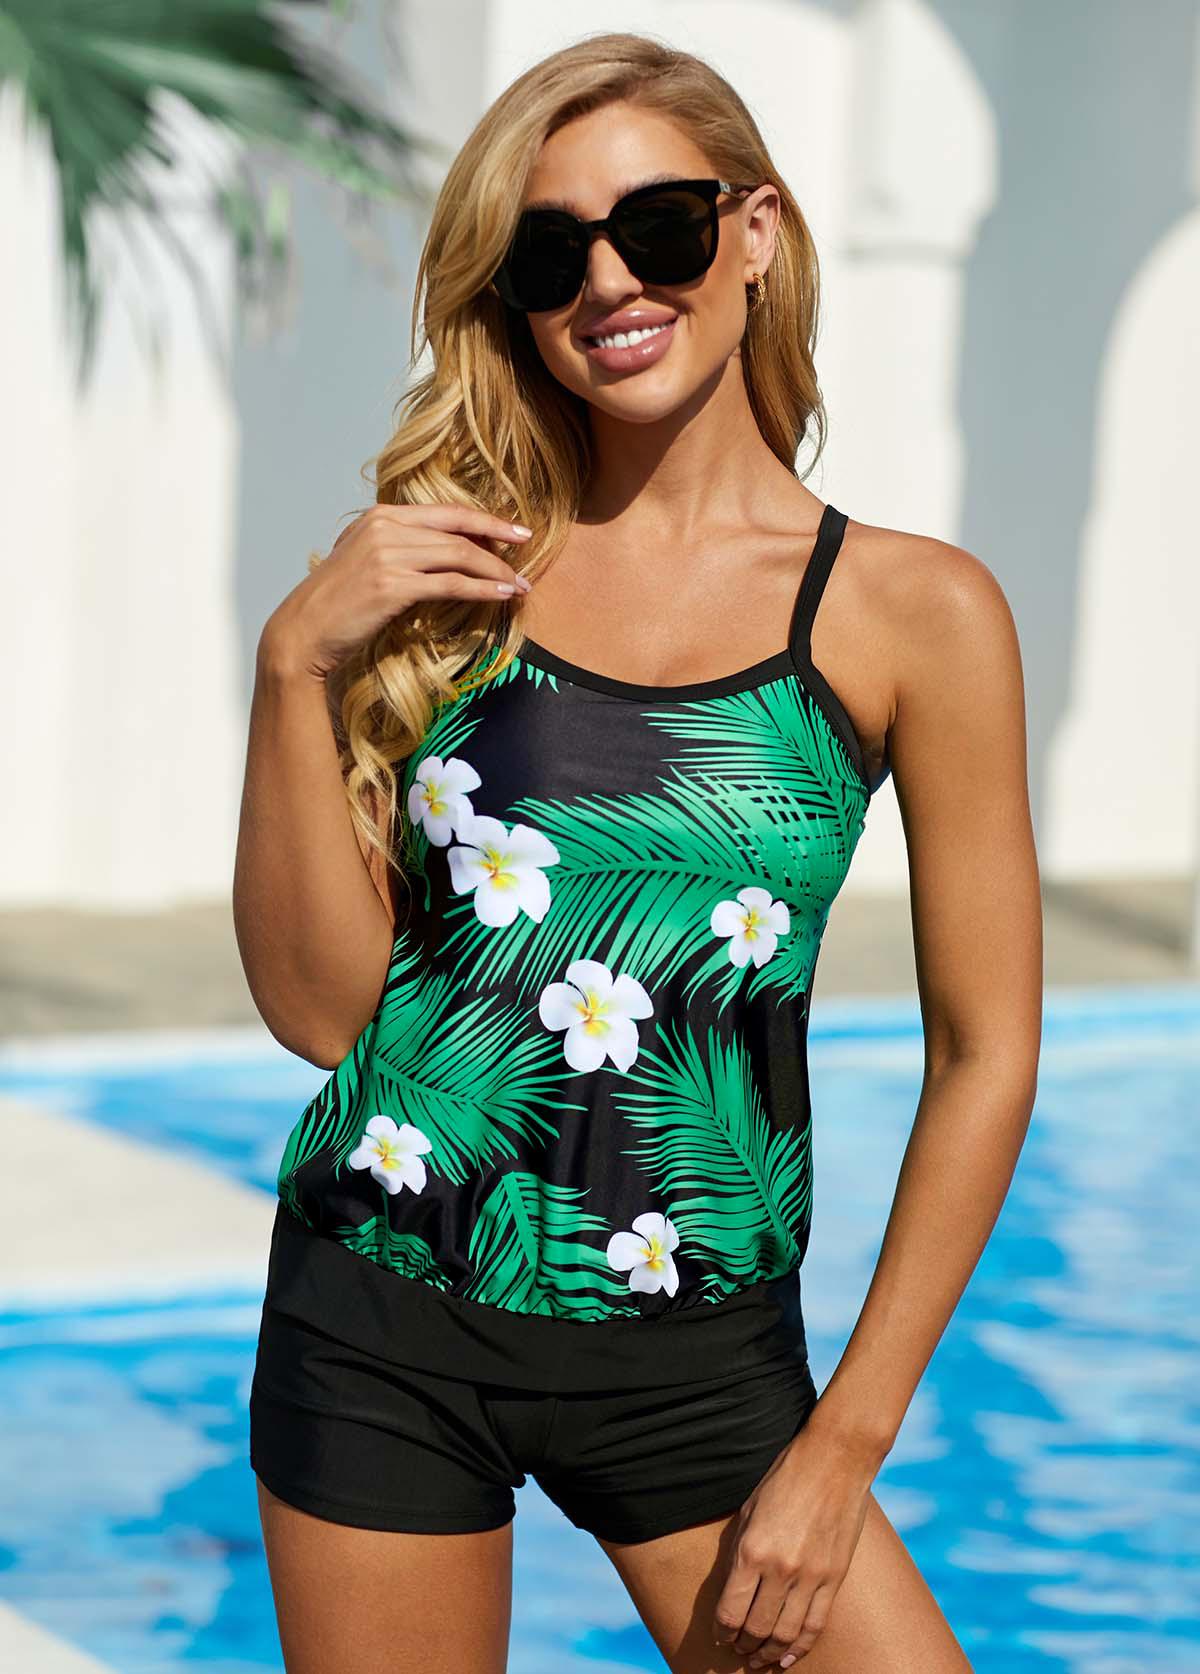 Spaghetti Strap Tropical and Floral Print Swimwear Top